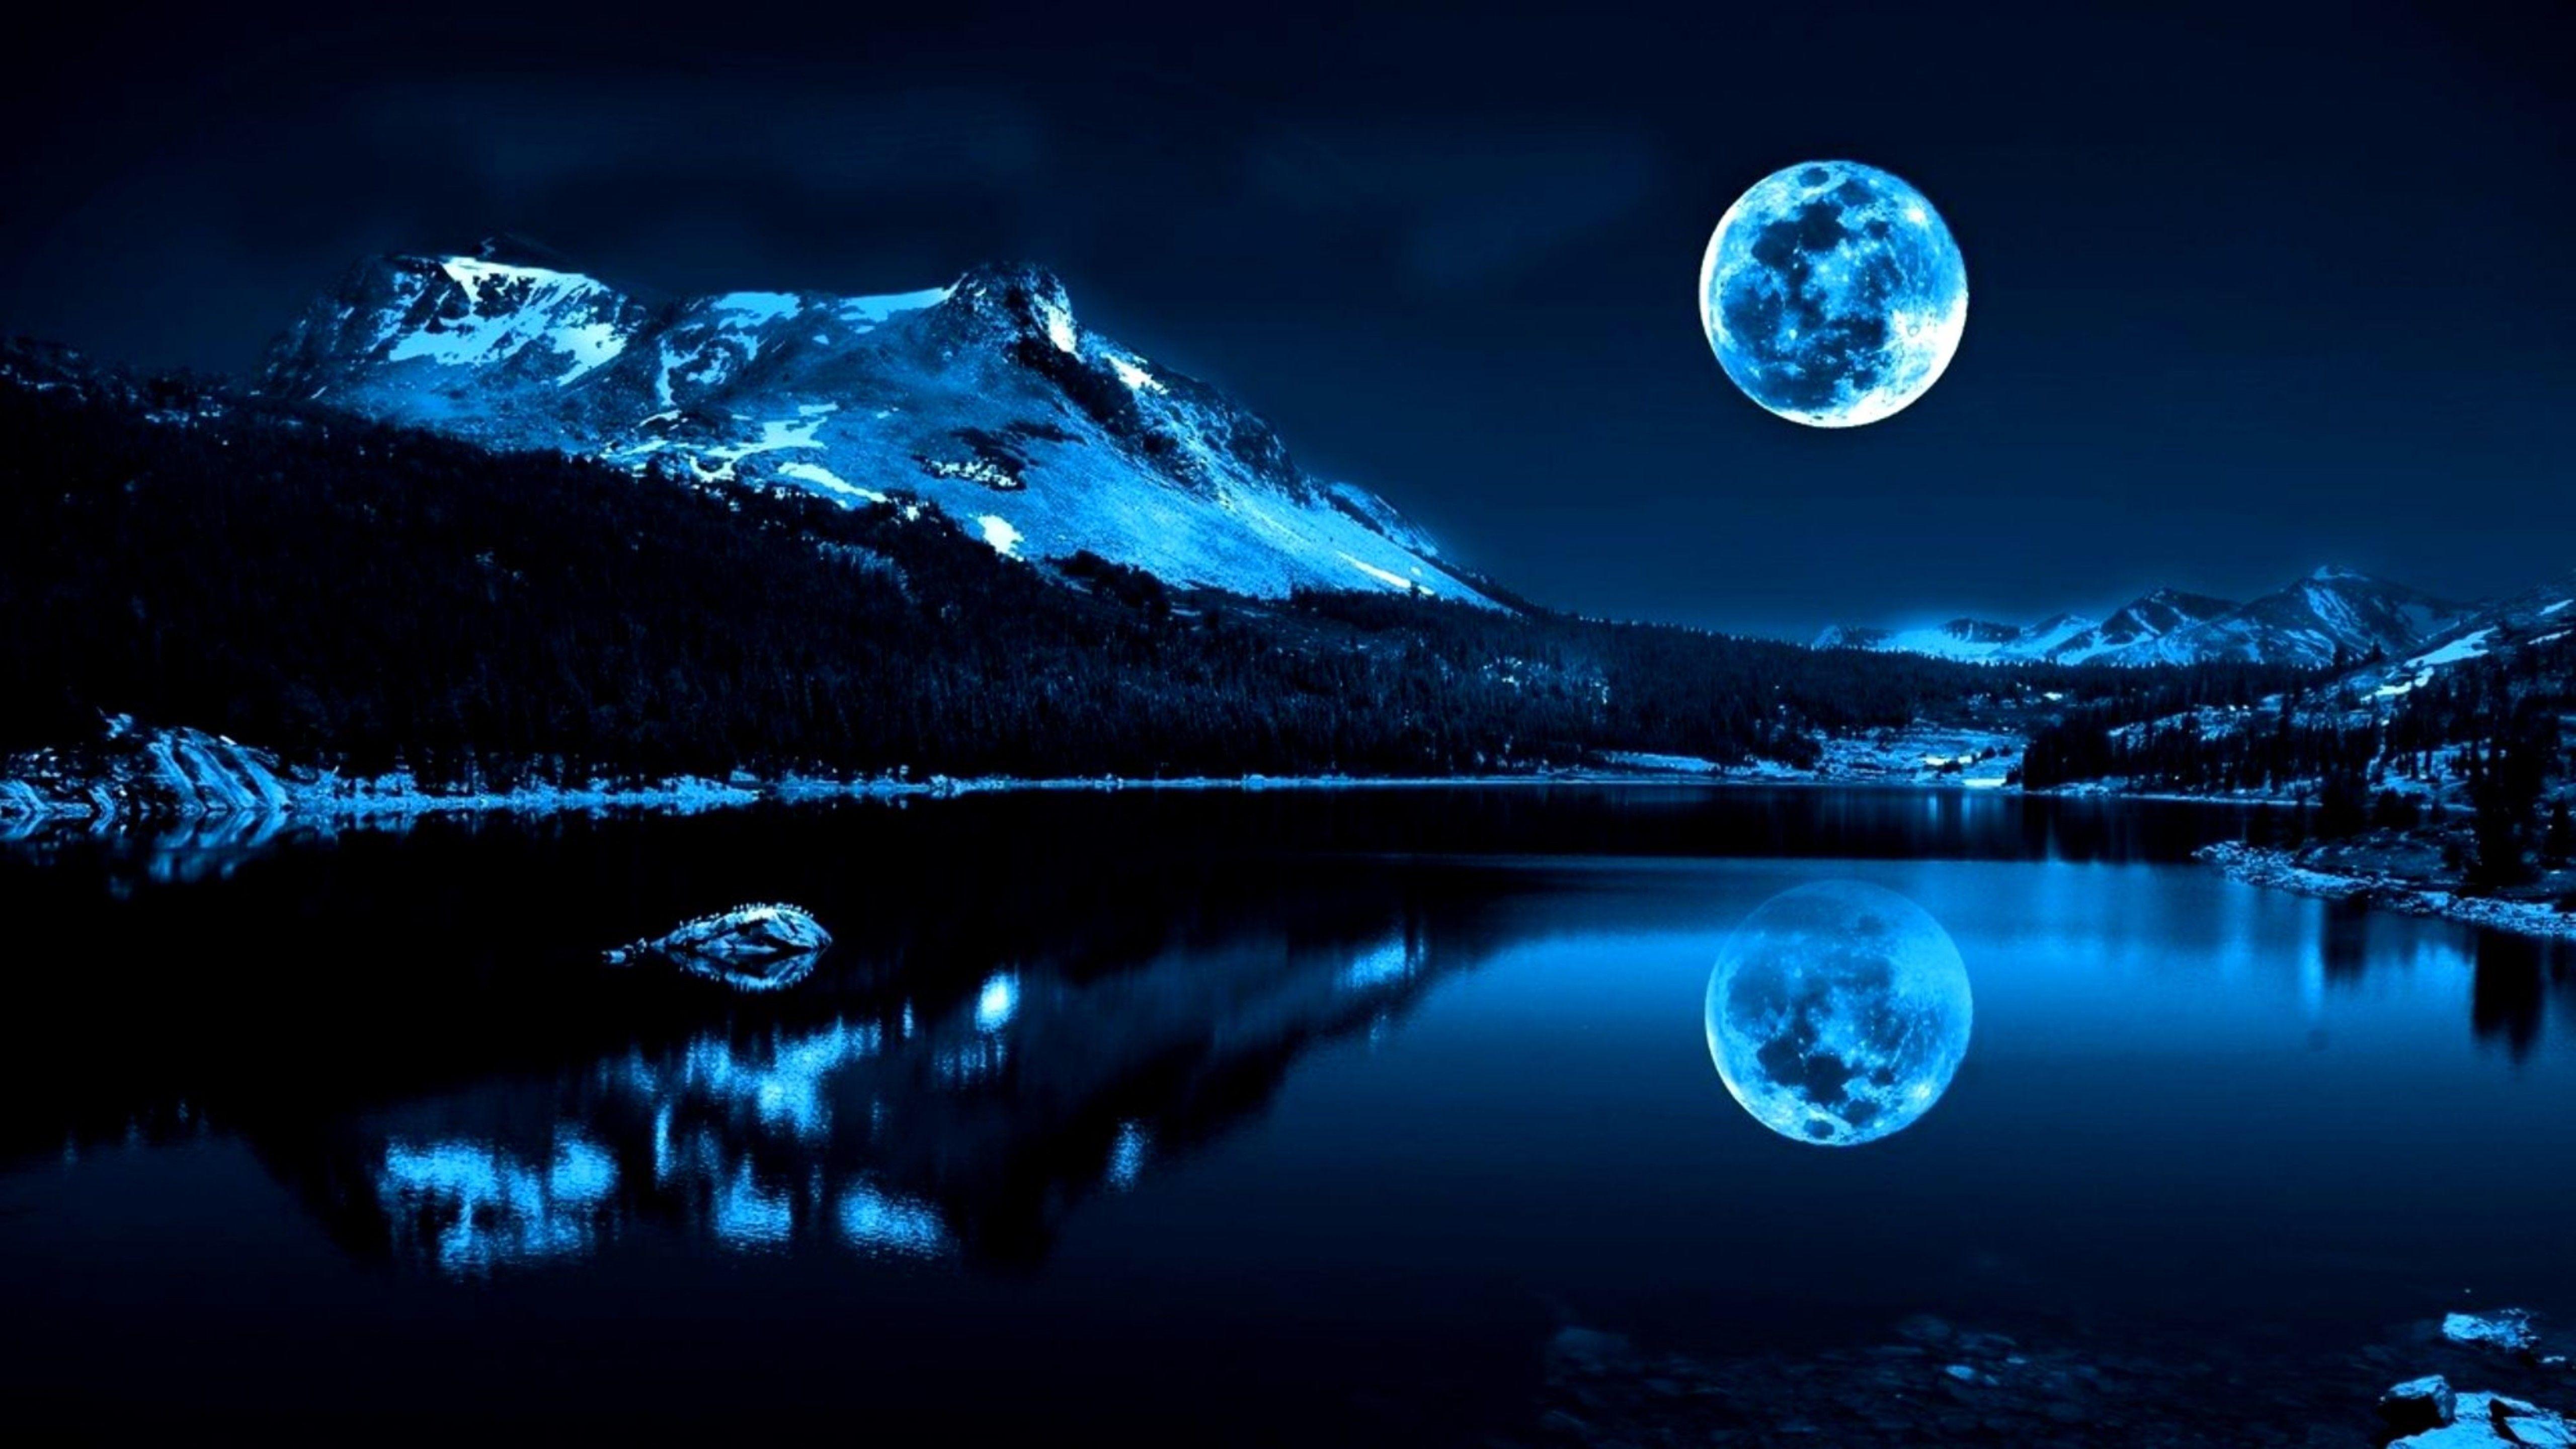 BEAUTIFUL WINTER NIGHT WALLPAPERS HD WAF1006